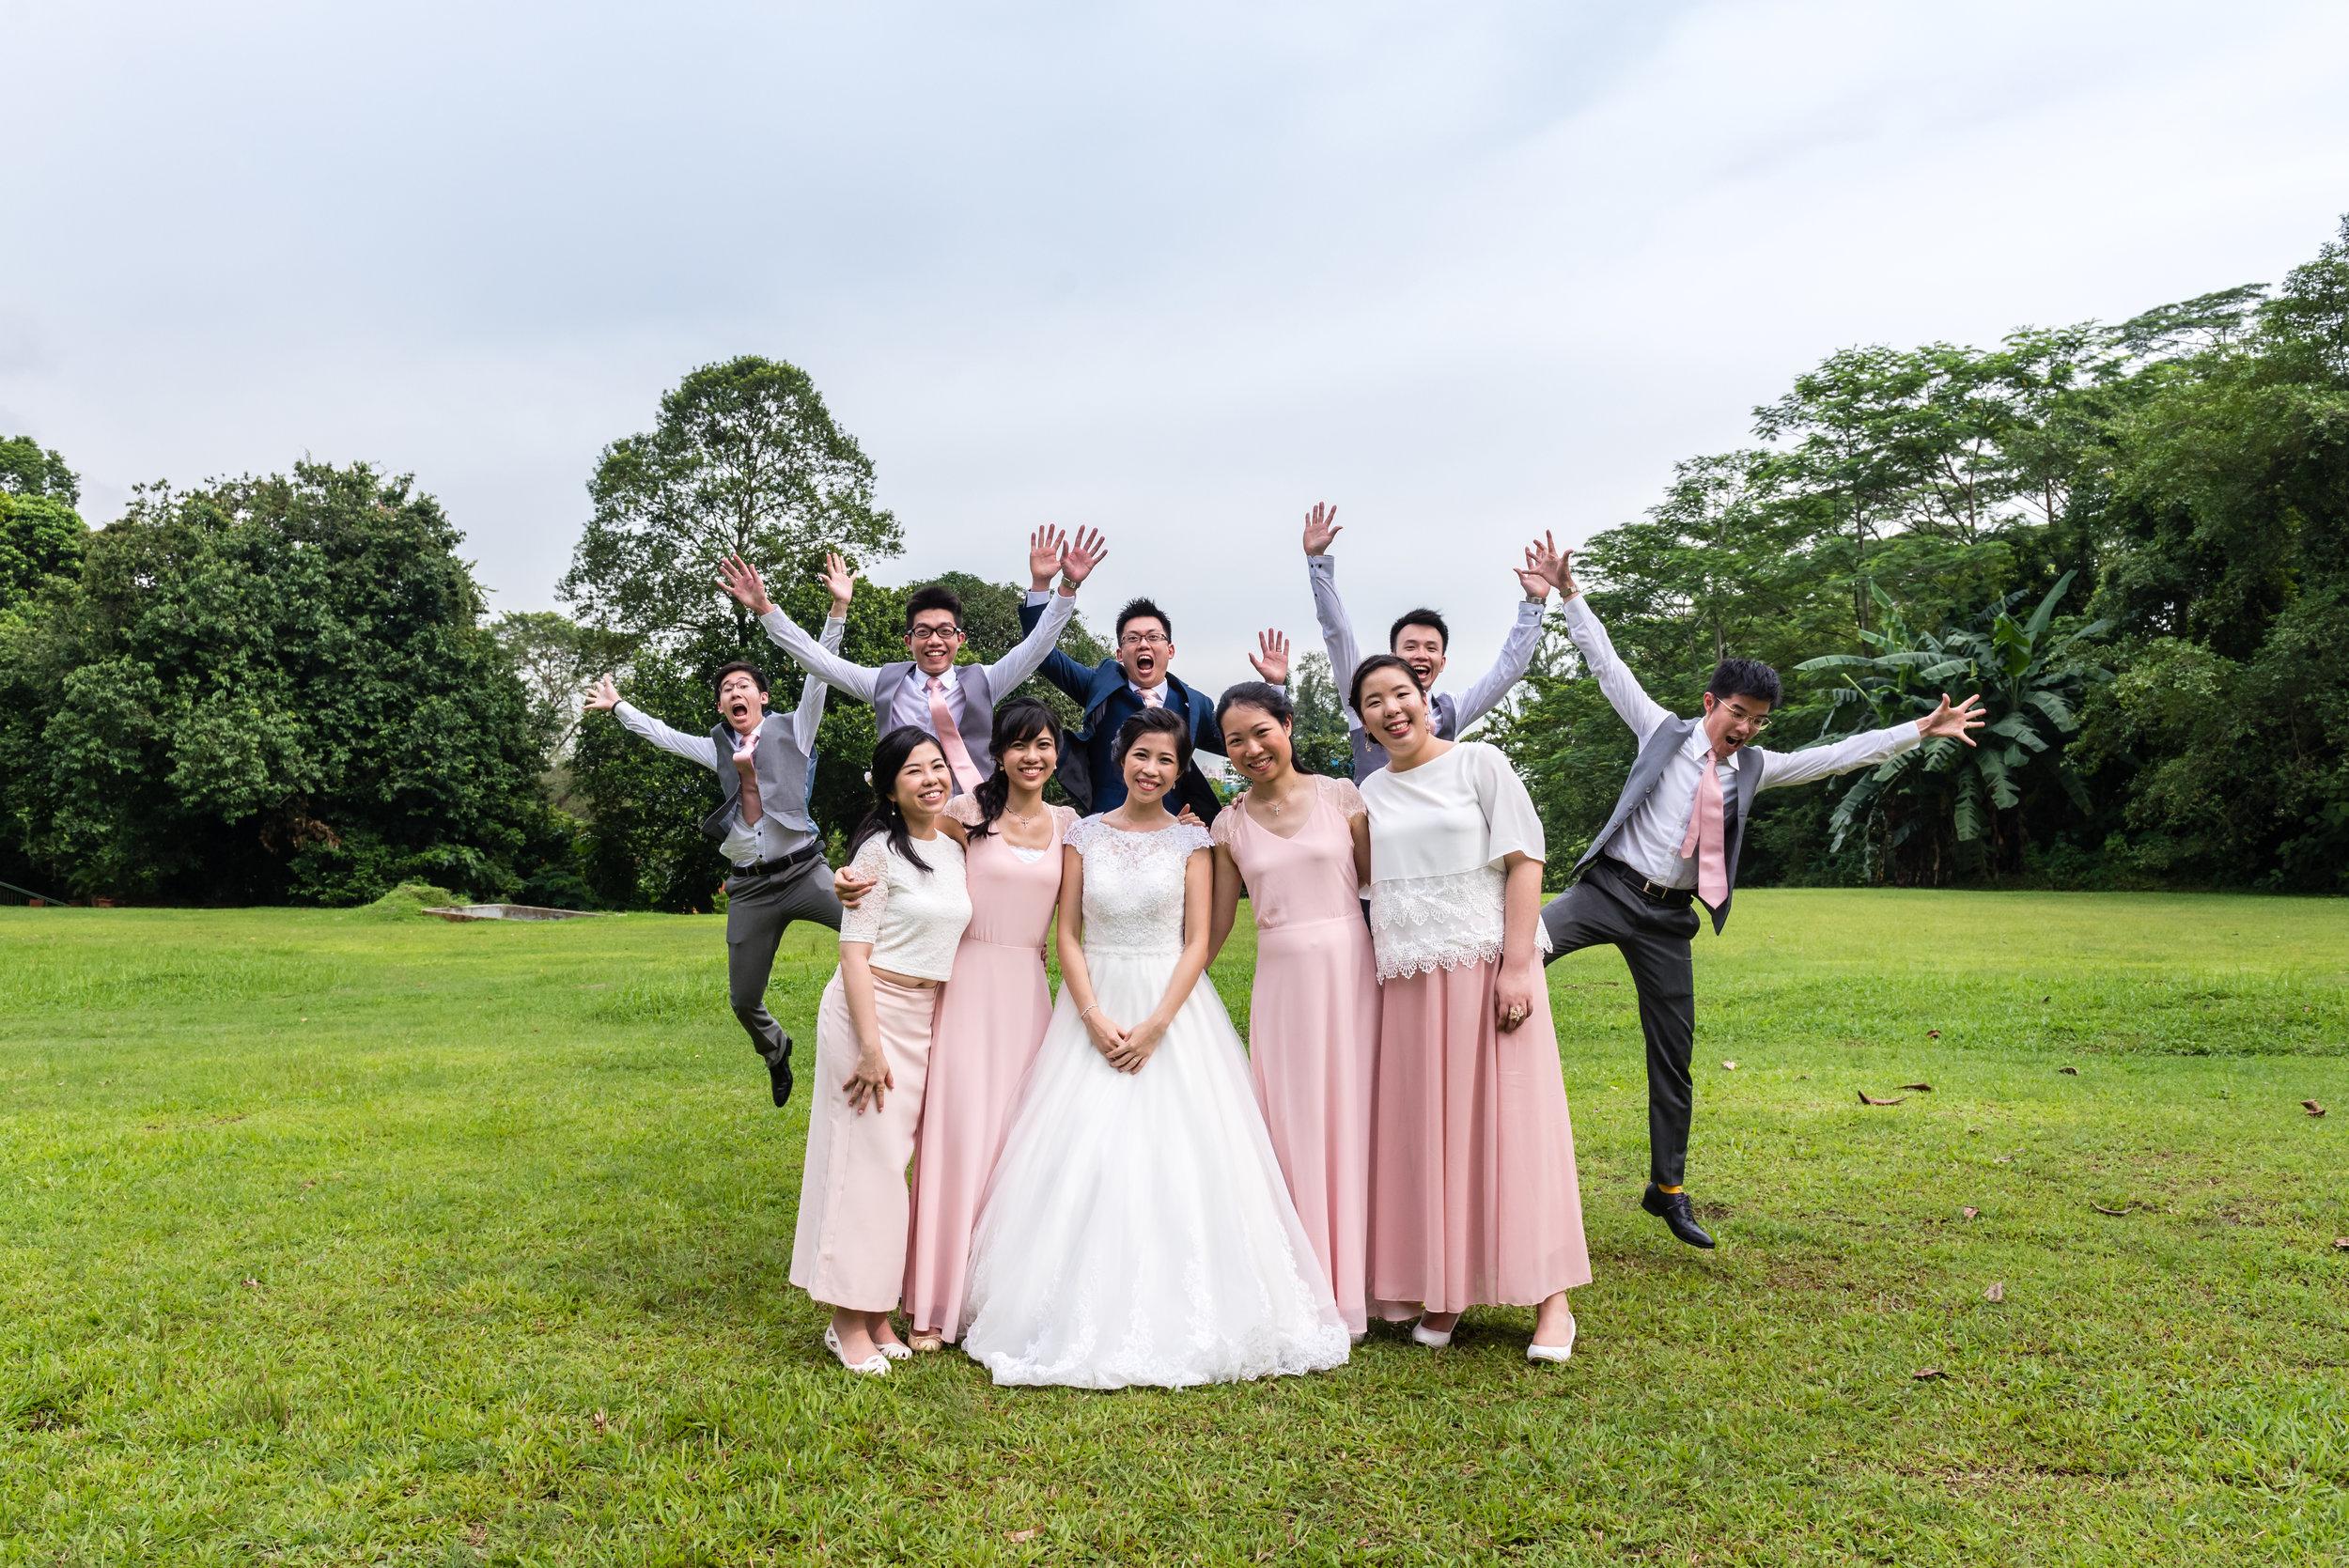 ad-wedding-photoshoot-white-rabbit-funny-bridal-party